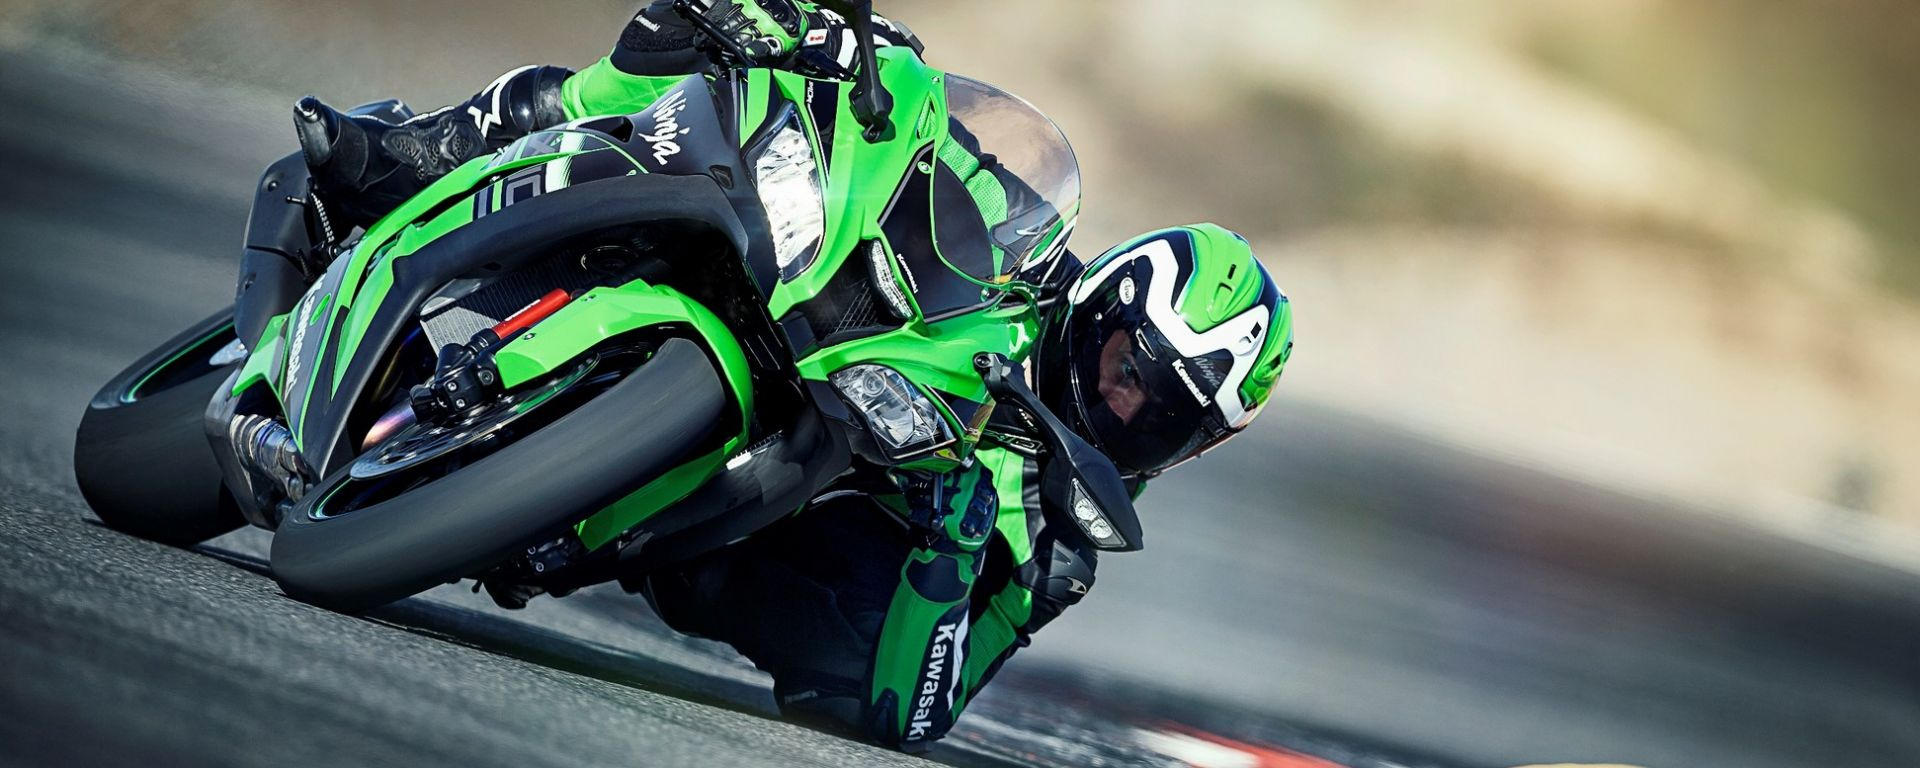 Kawasaki a Motodays 2016